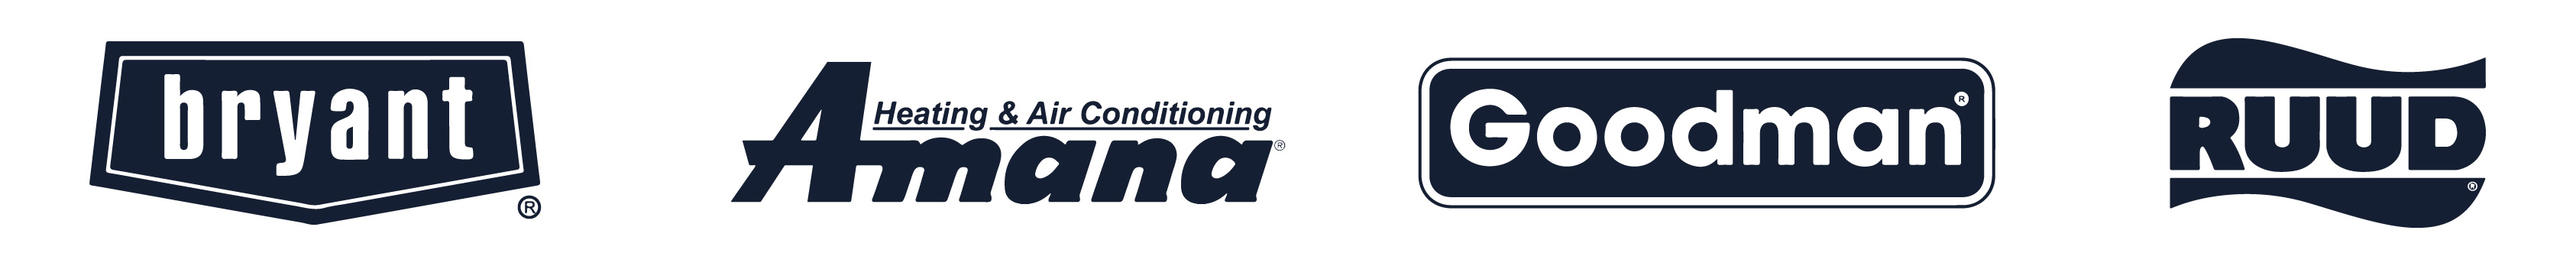 HVAC Equipment Brands